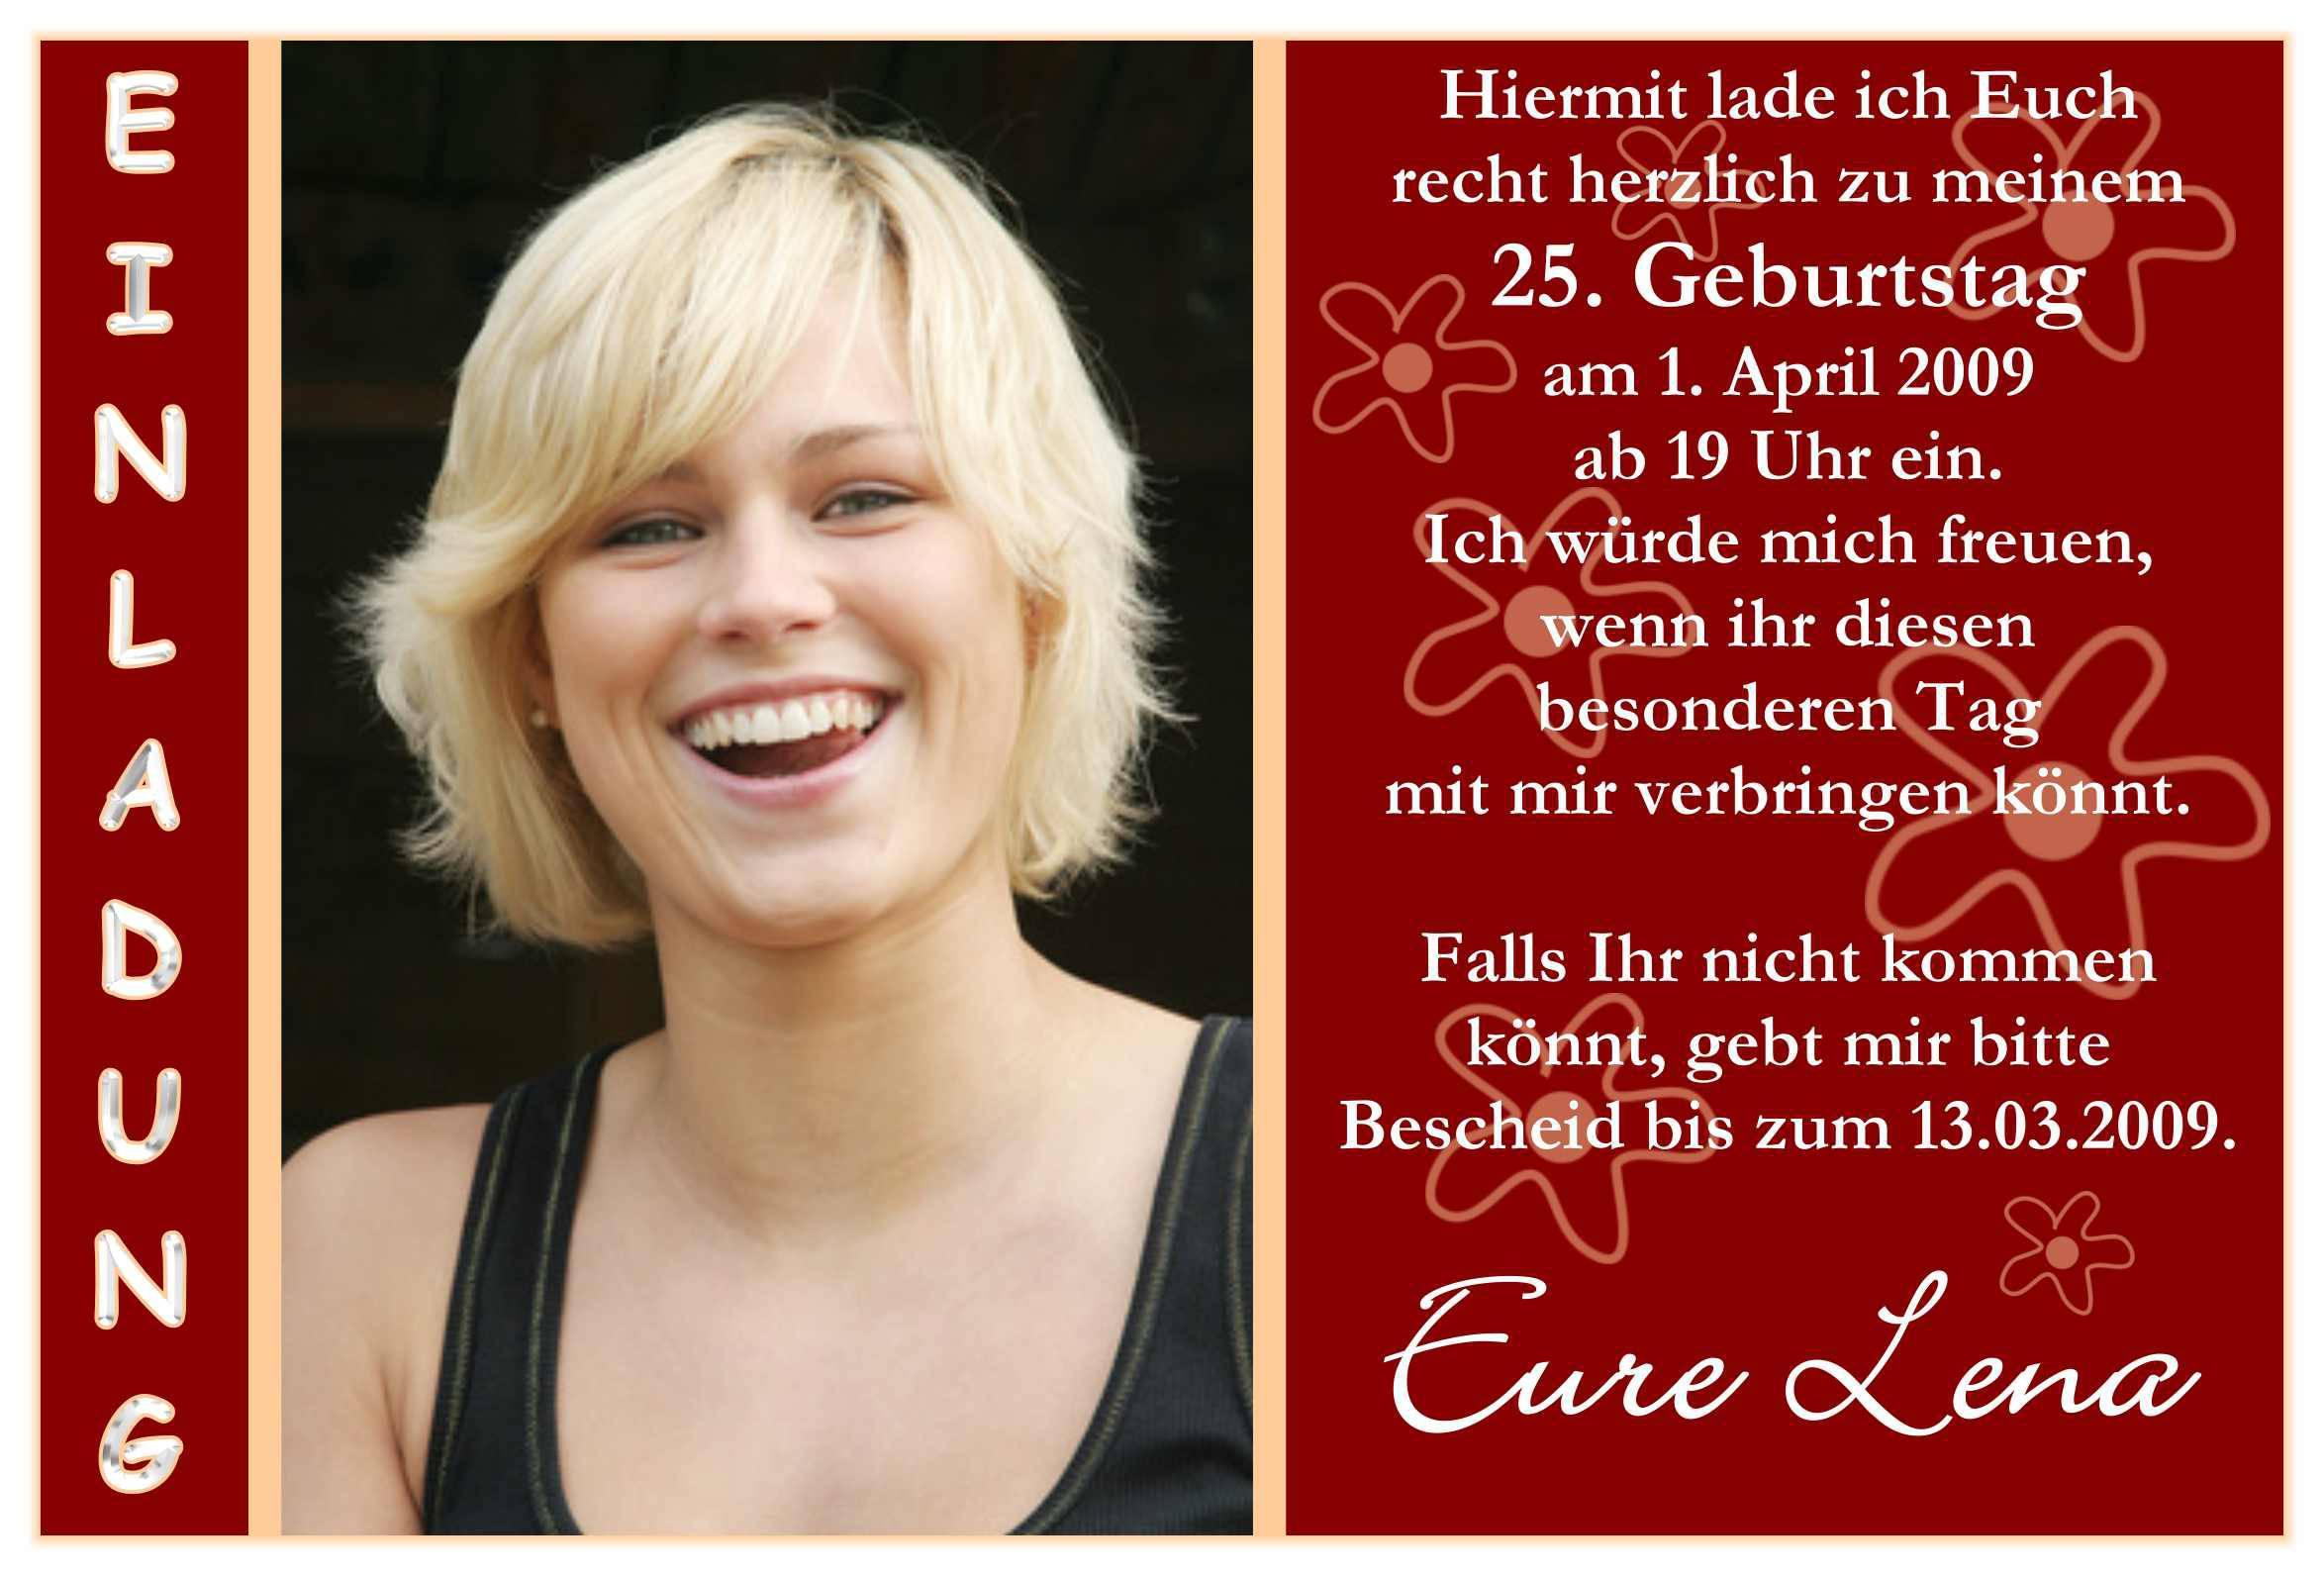 Einladung Geburtstag : Einladung Geburtstag Vorlage Word - Geburstag ...